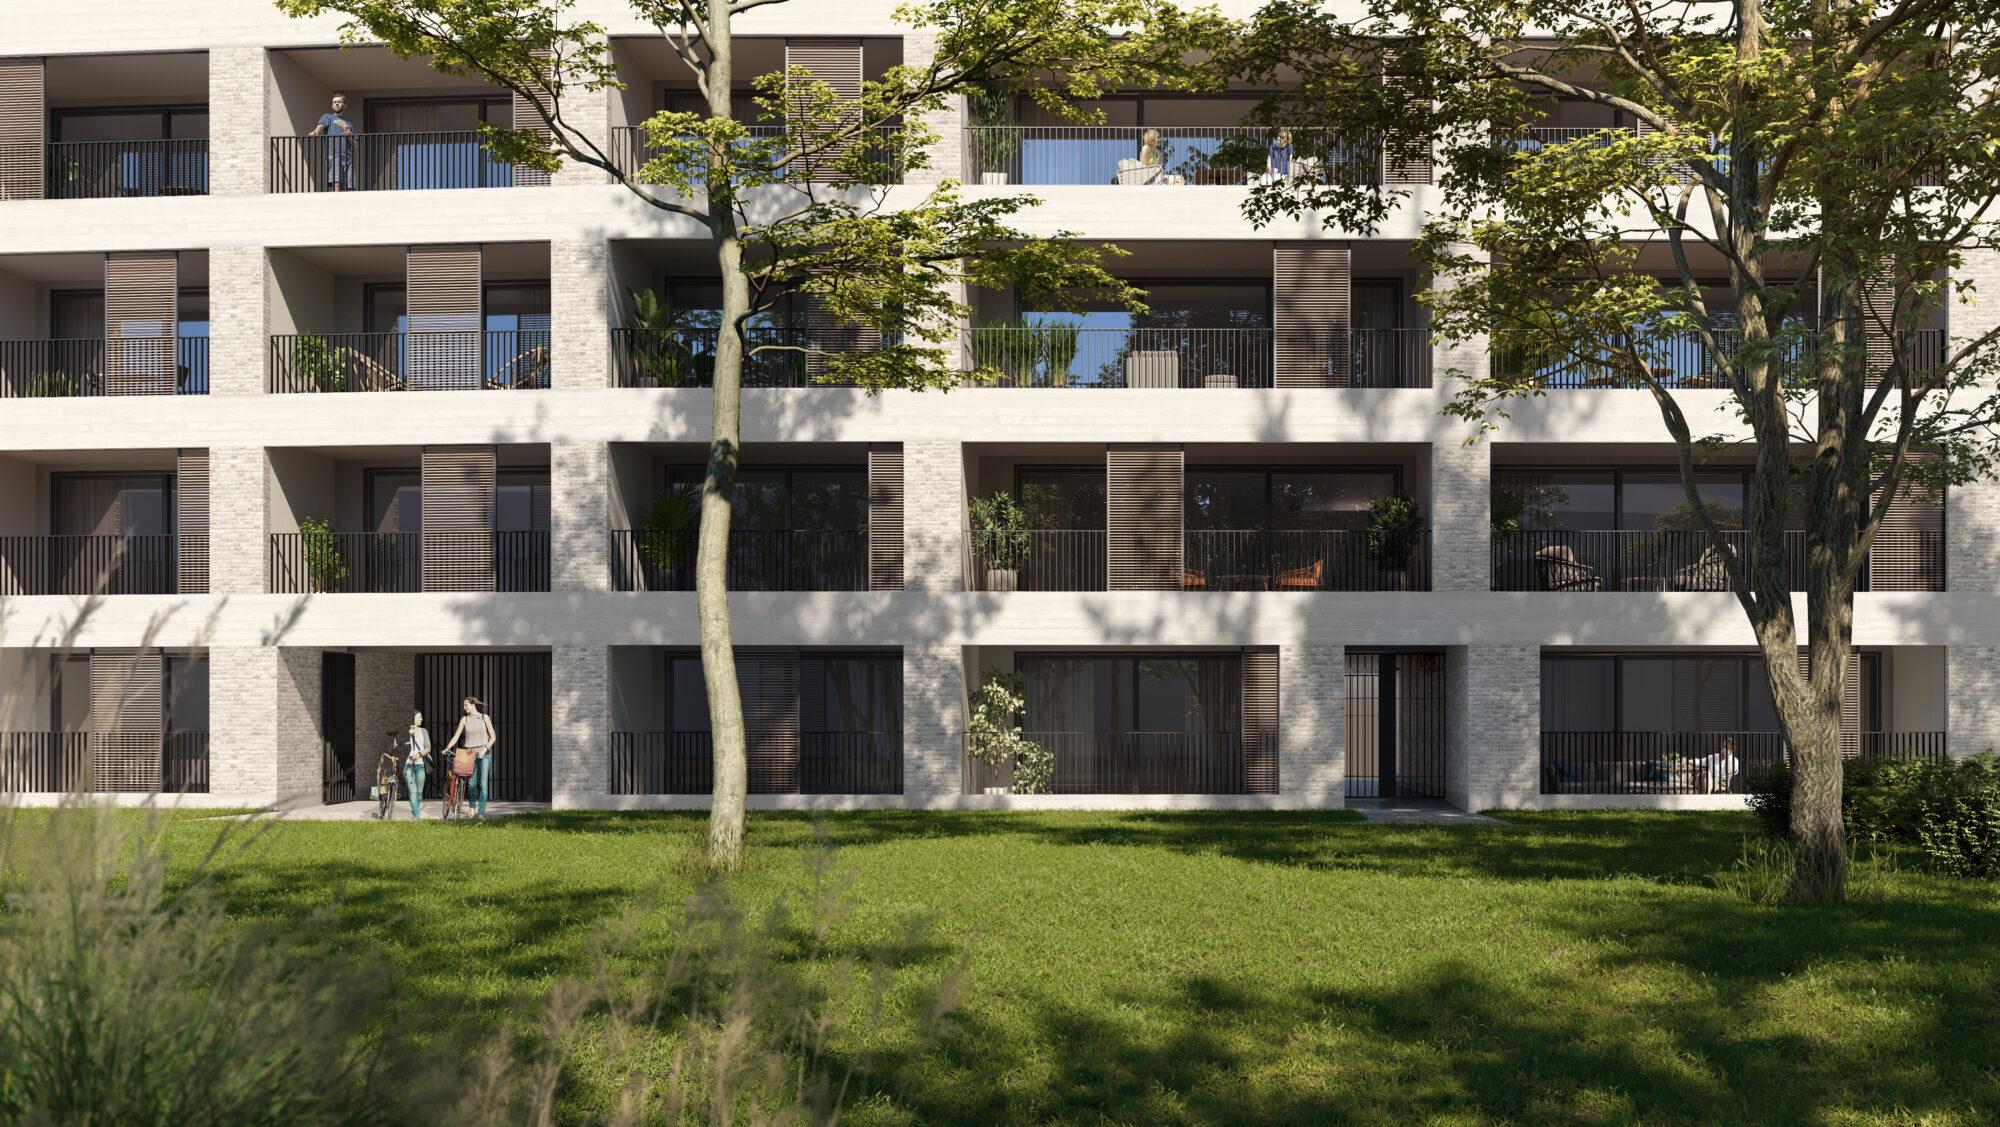 7655 kolmont refuga images exterior A3 City Apartment final